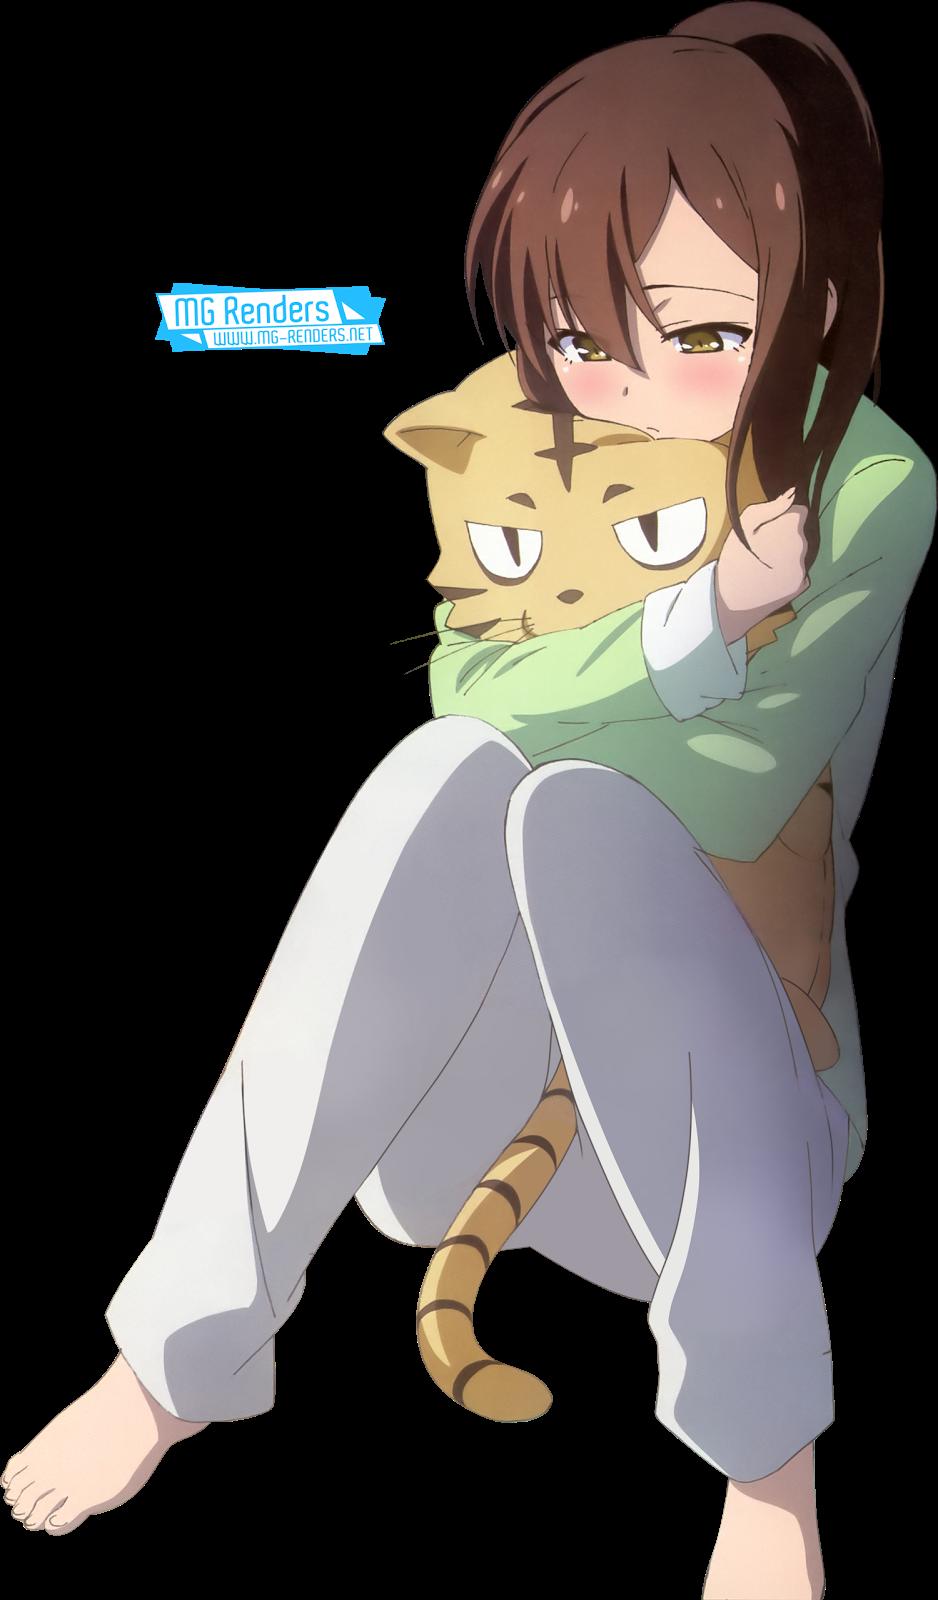 Tags: Anime, Render,  Aoyama Nanami,  Sakurasou no Pet na Kanojo, PNG, Image, Picture